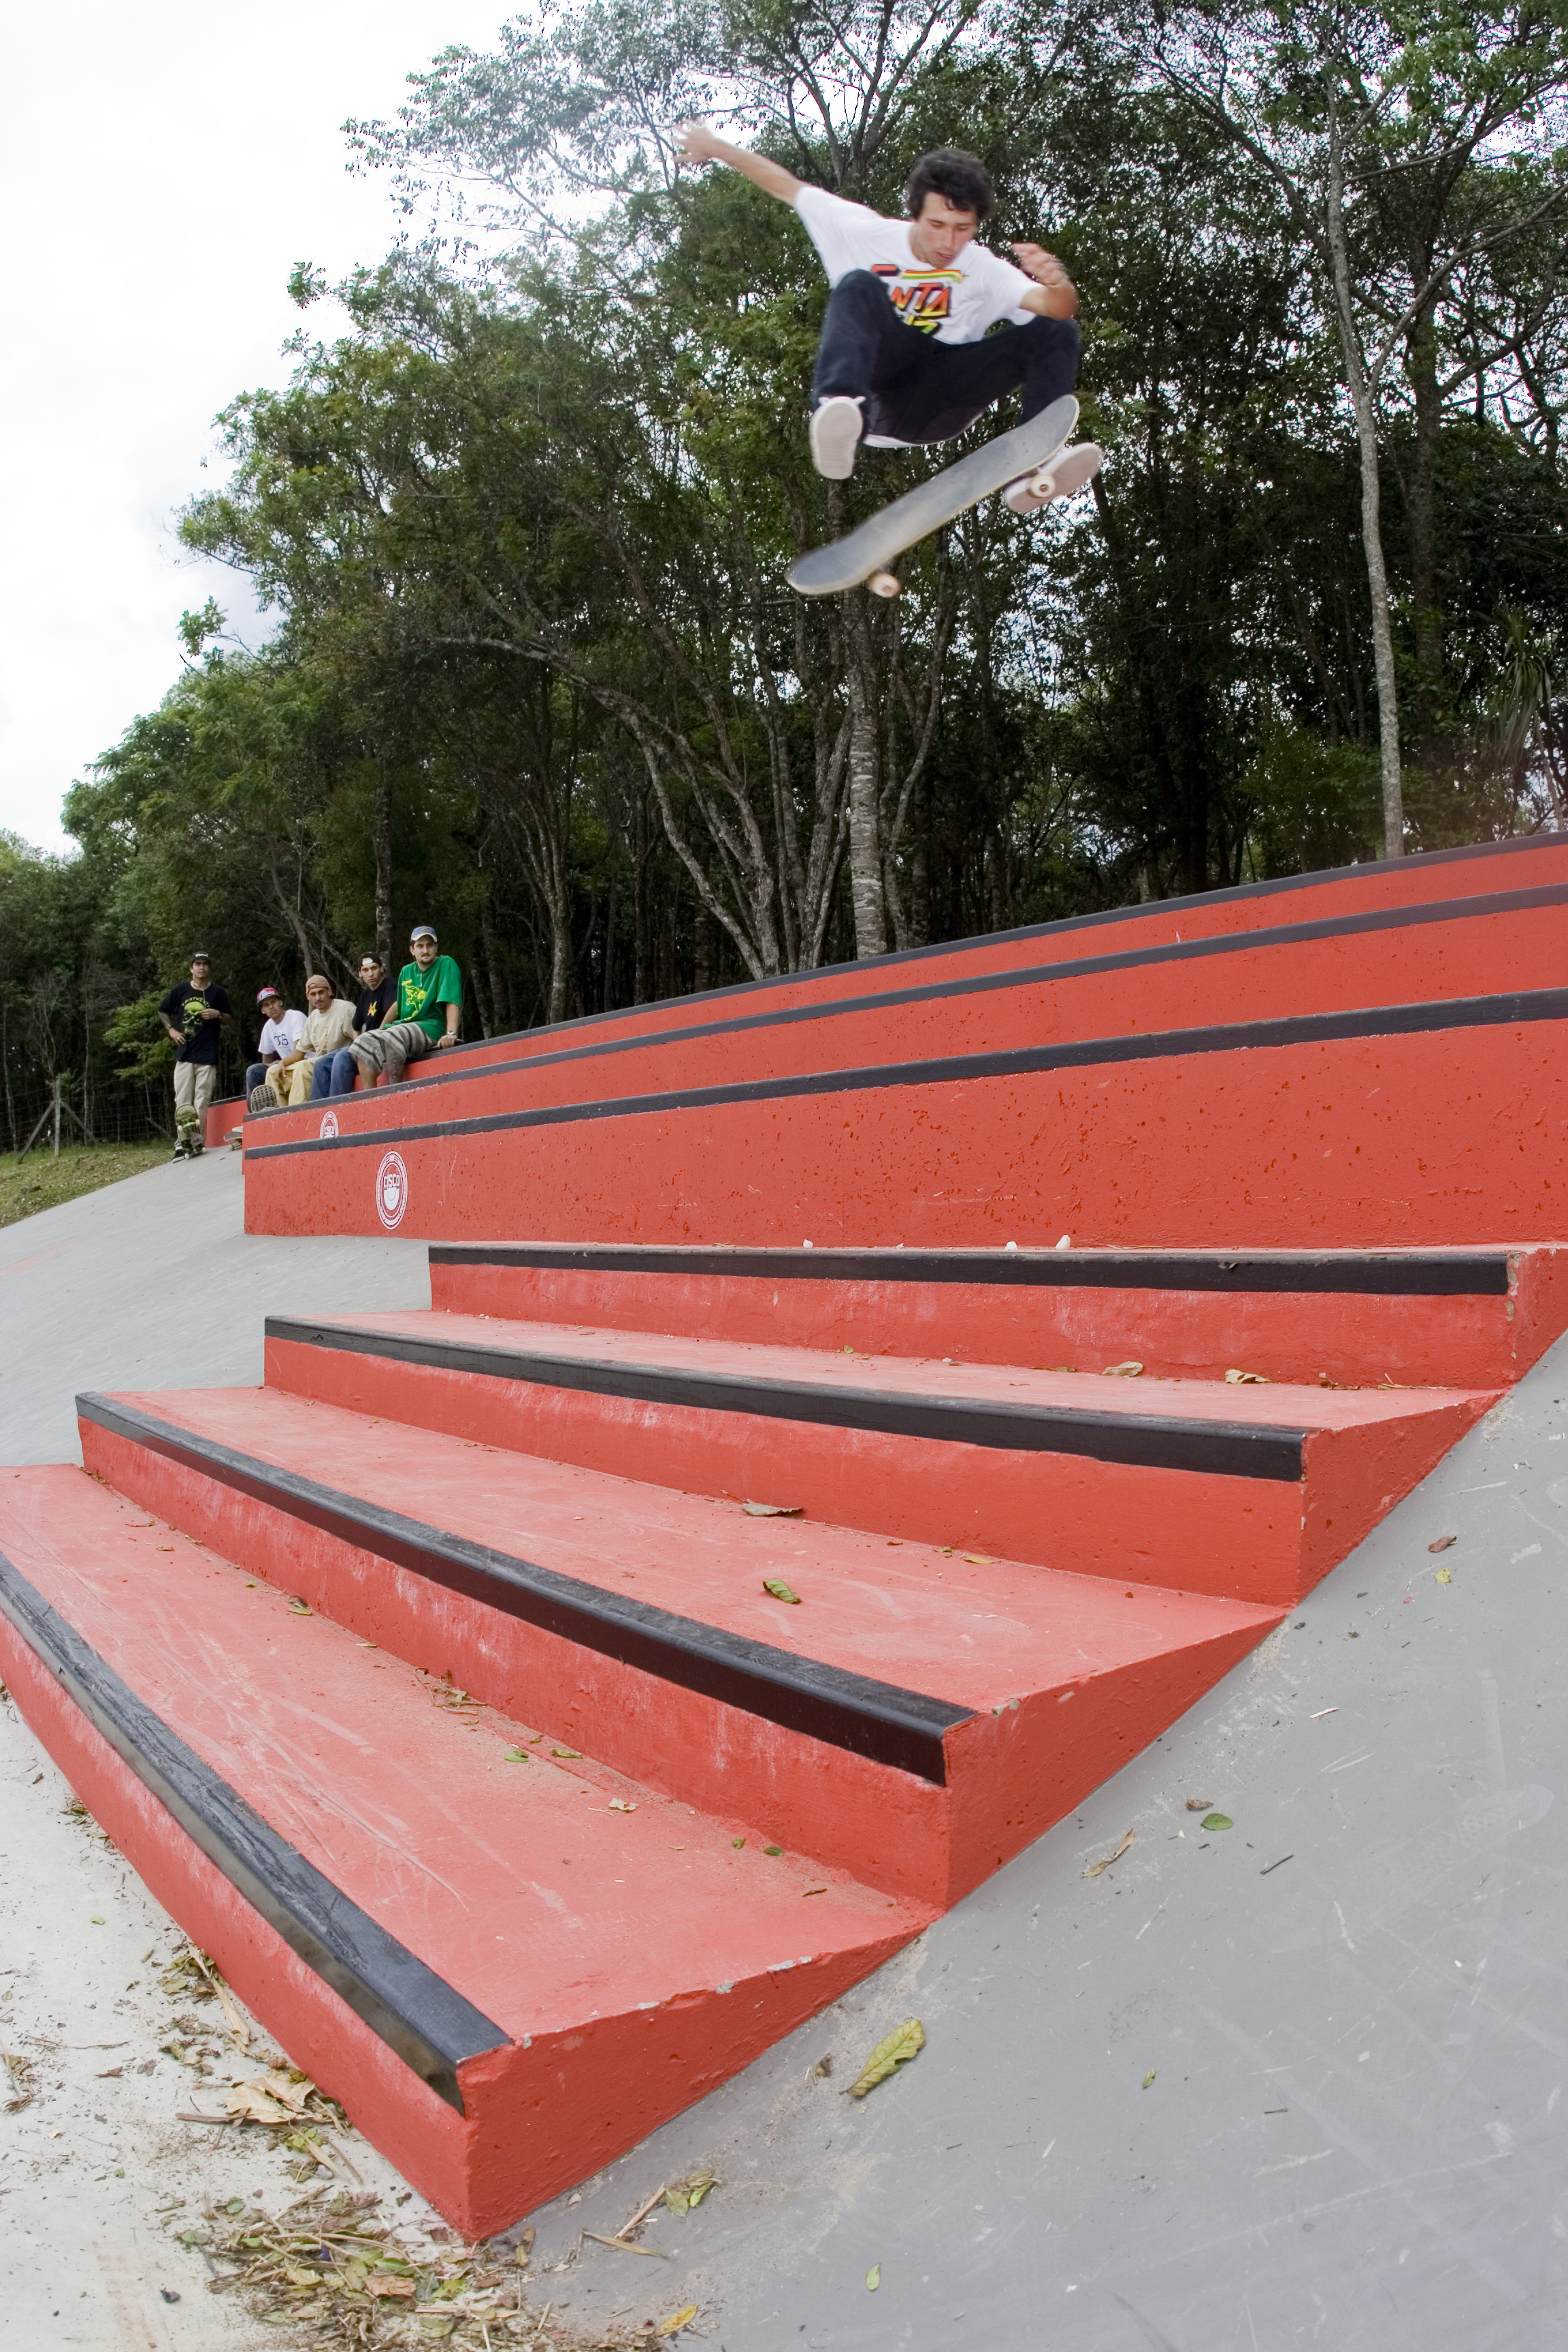 Evandro Martins - 360 Kickflip